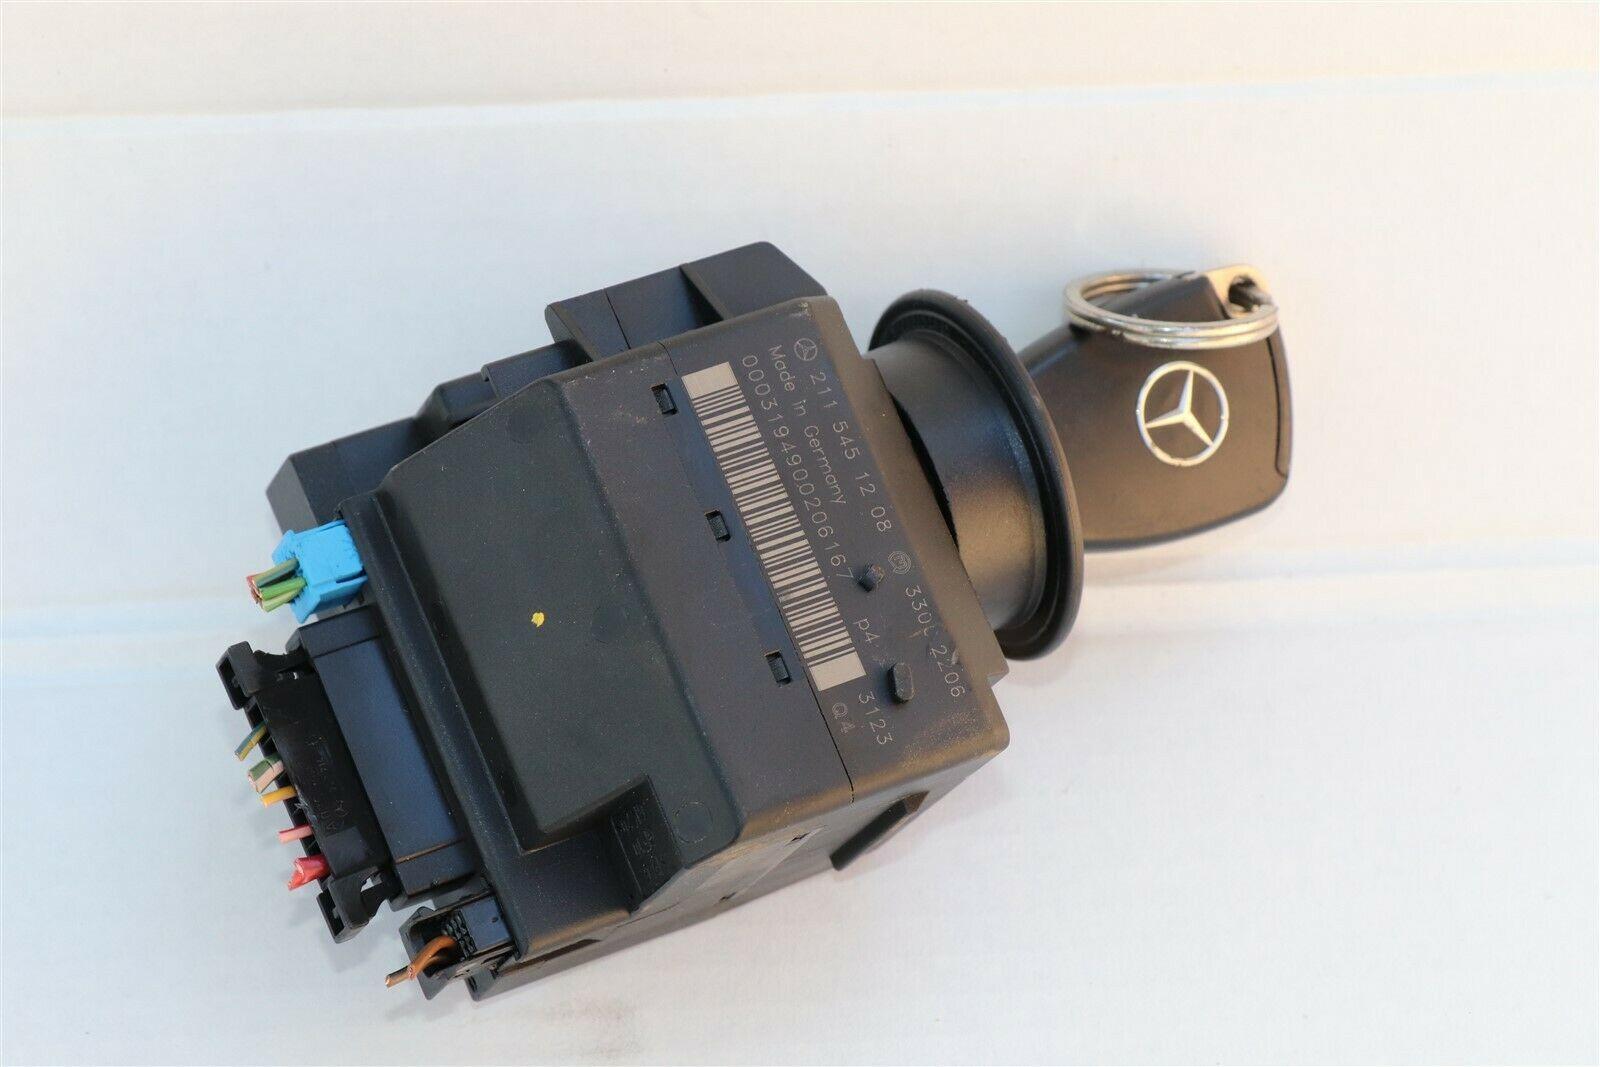 Mercedes Ignition Start Switch Module & Key Fob Keyless Entry Remote 2115451208